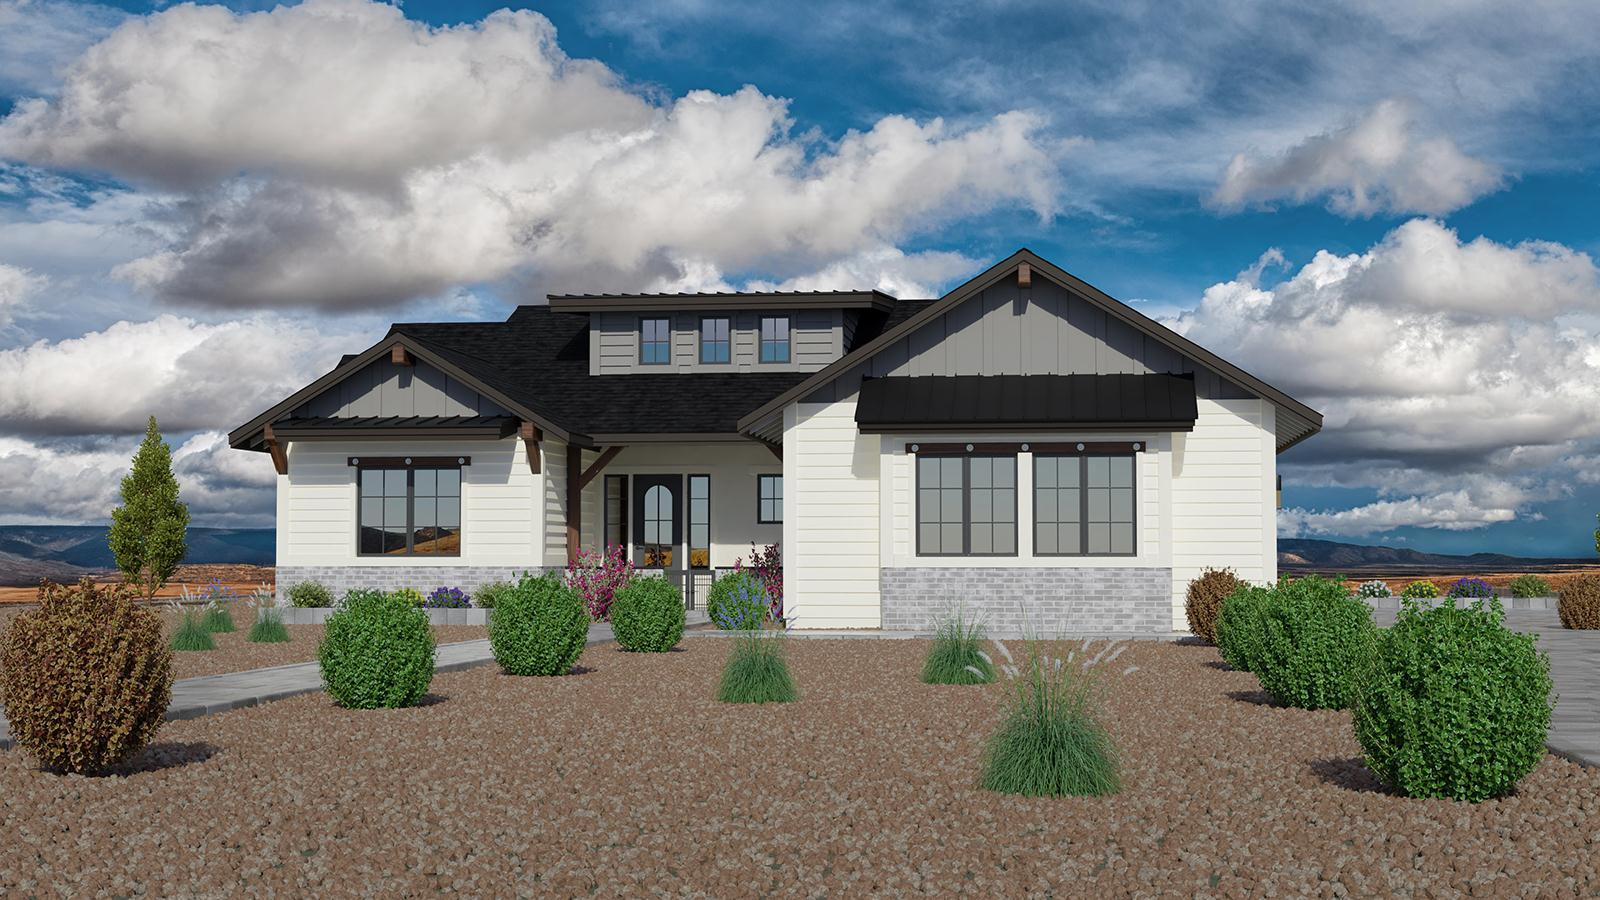 Exterior featured in the Jasper Featured Plan 2189 By Capstone Homes in Prescott, AZ